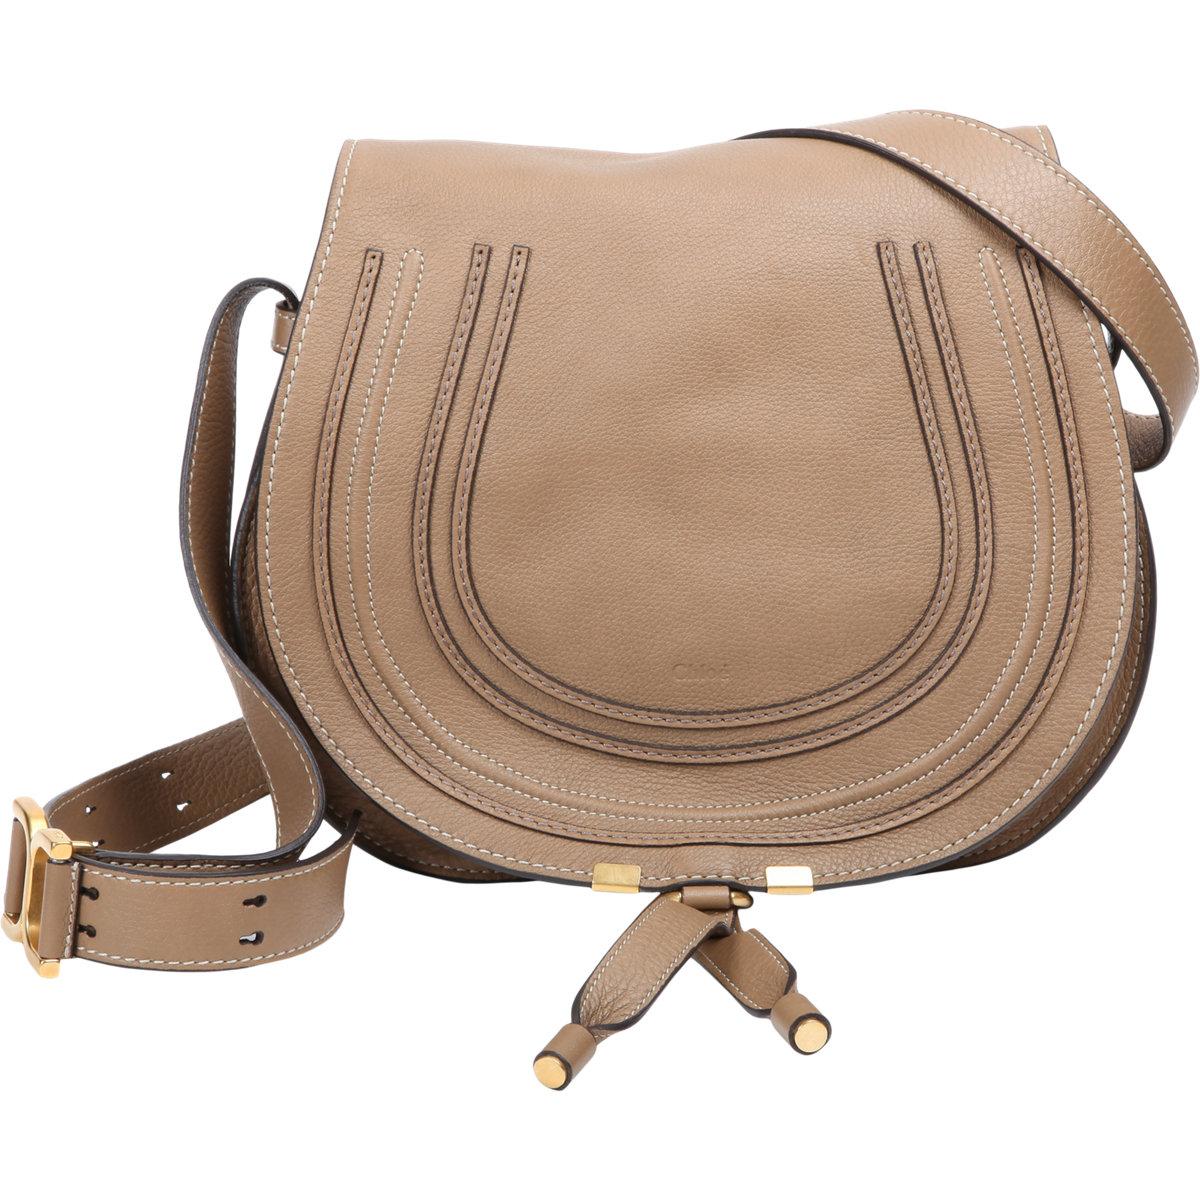 chloe imitation bags - Chlo�� Marcie Leather Saddle Bag in Brown | Lyst